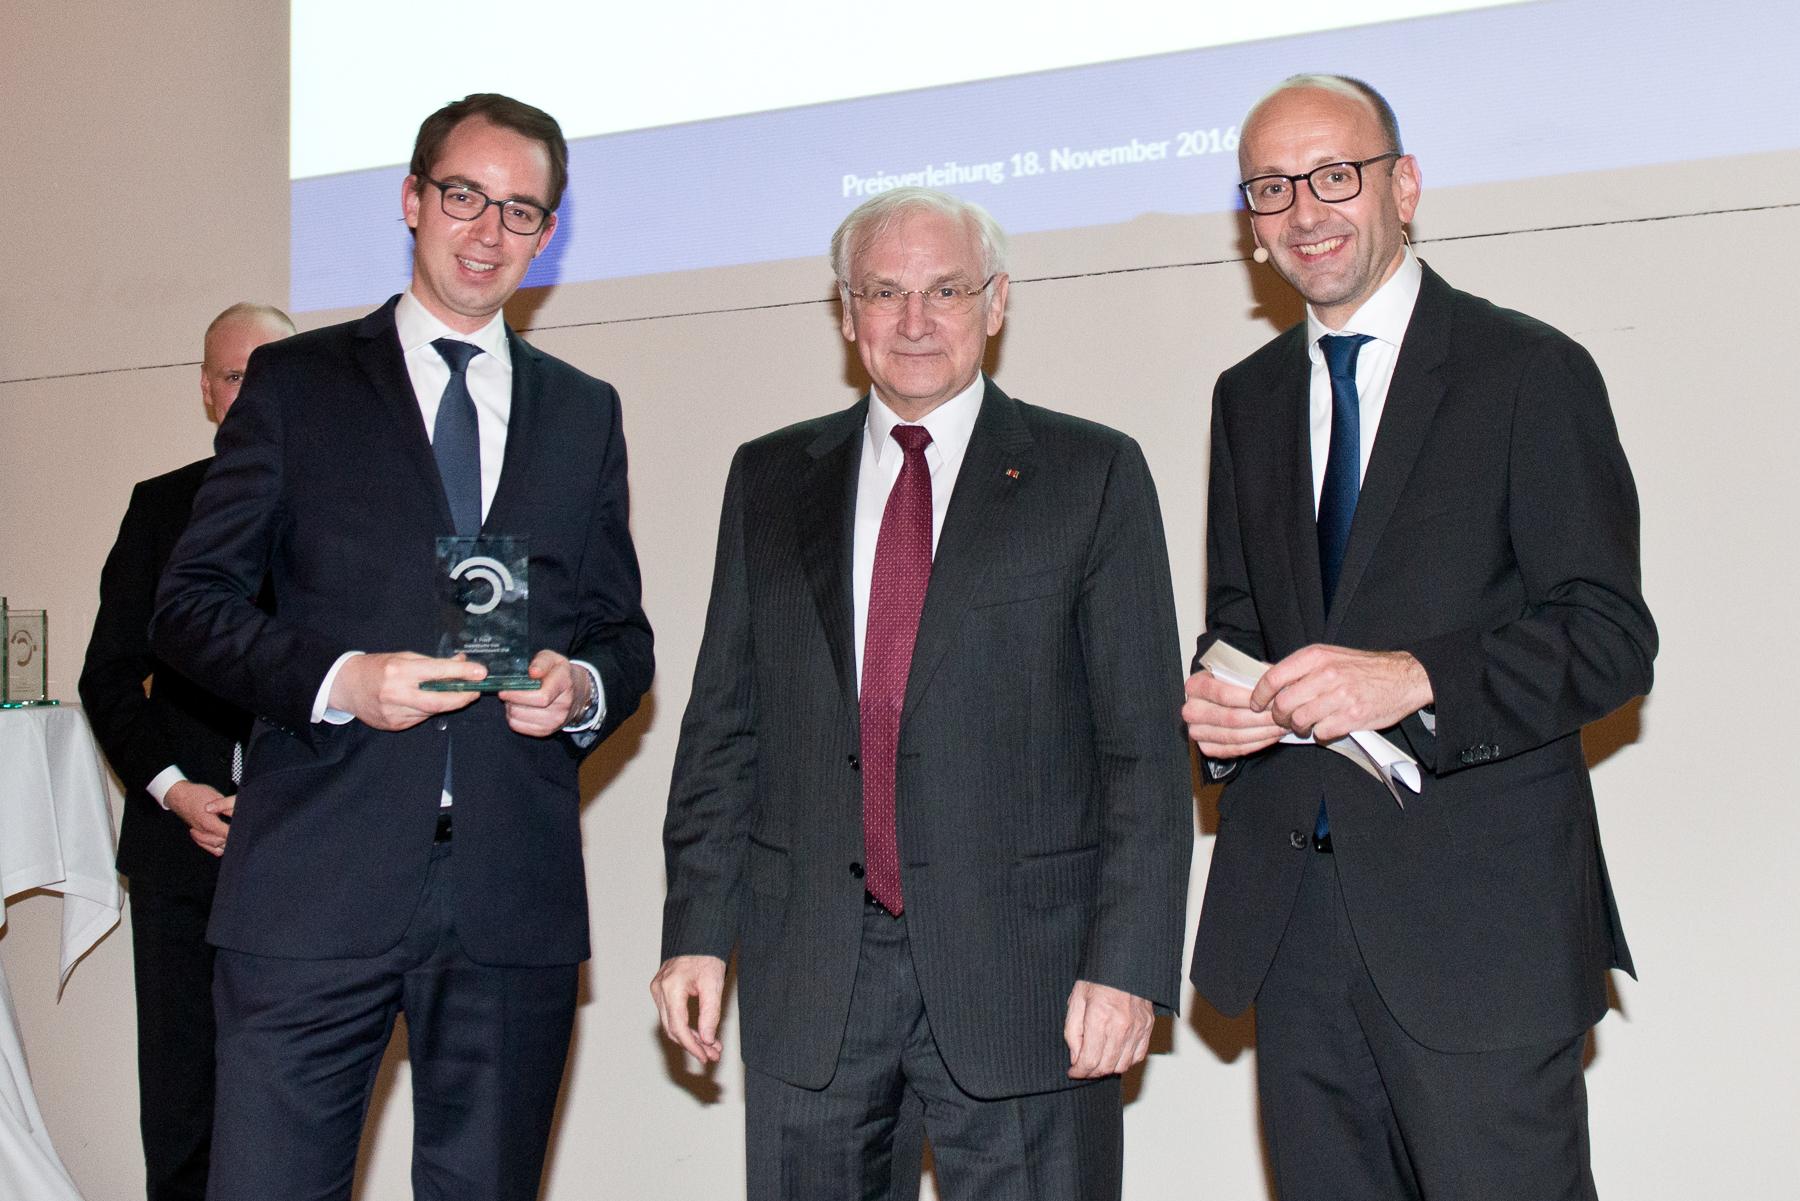 Dr Helge Pühl (3rd prize), Prof. Siegfried Beck, Prof. Lucas F. Flöther